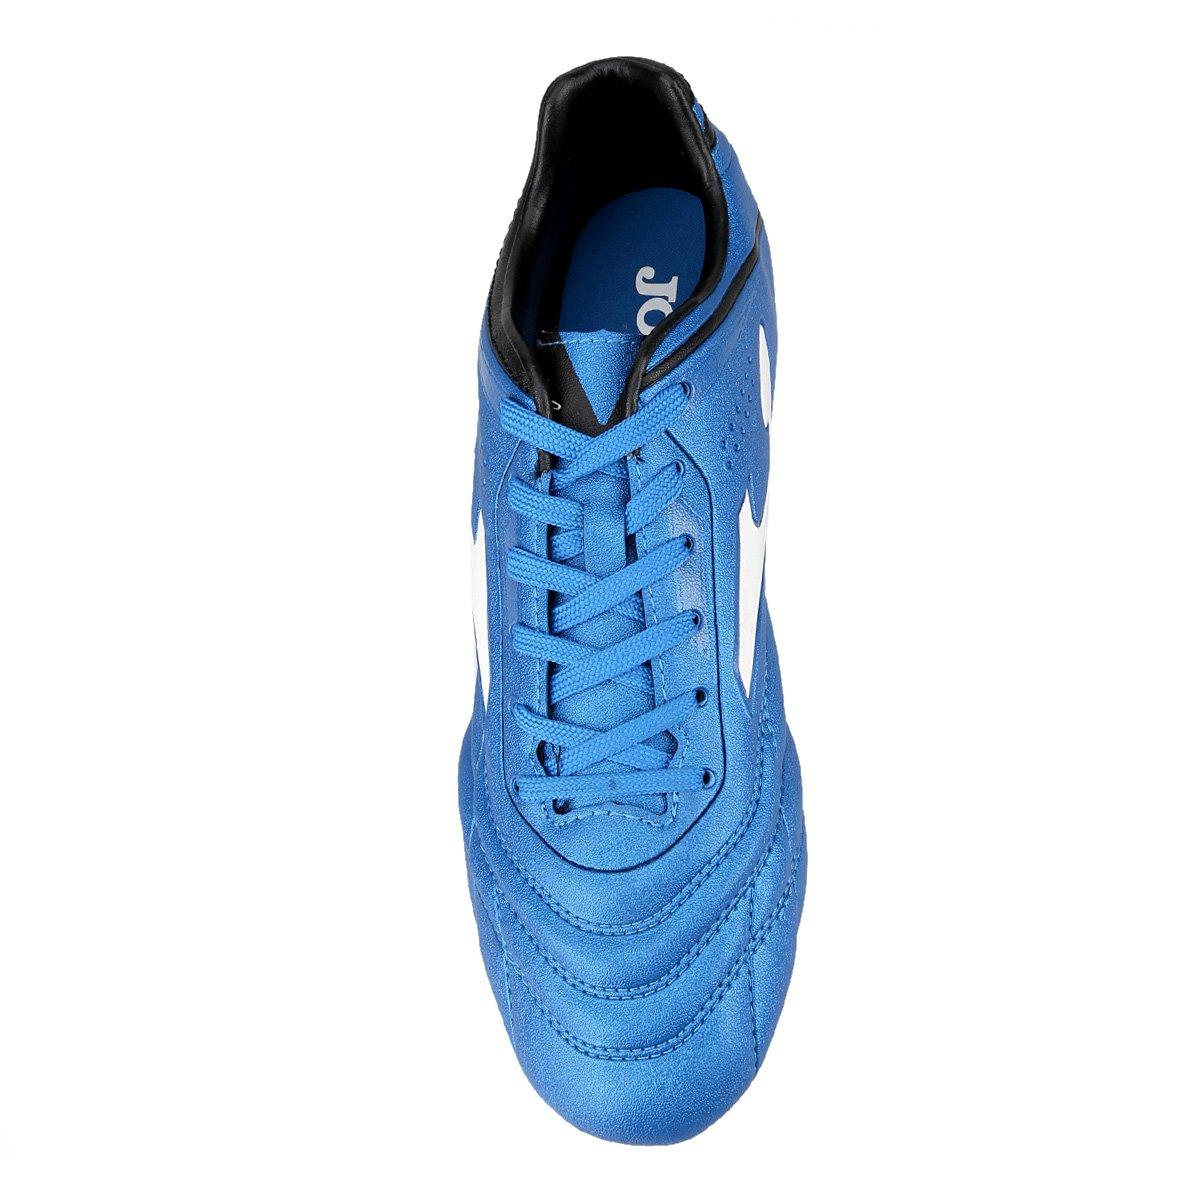 Chuteira Campo Joma Aguila - Azul - Compre Agora  94ace988ce133